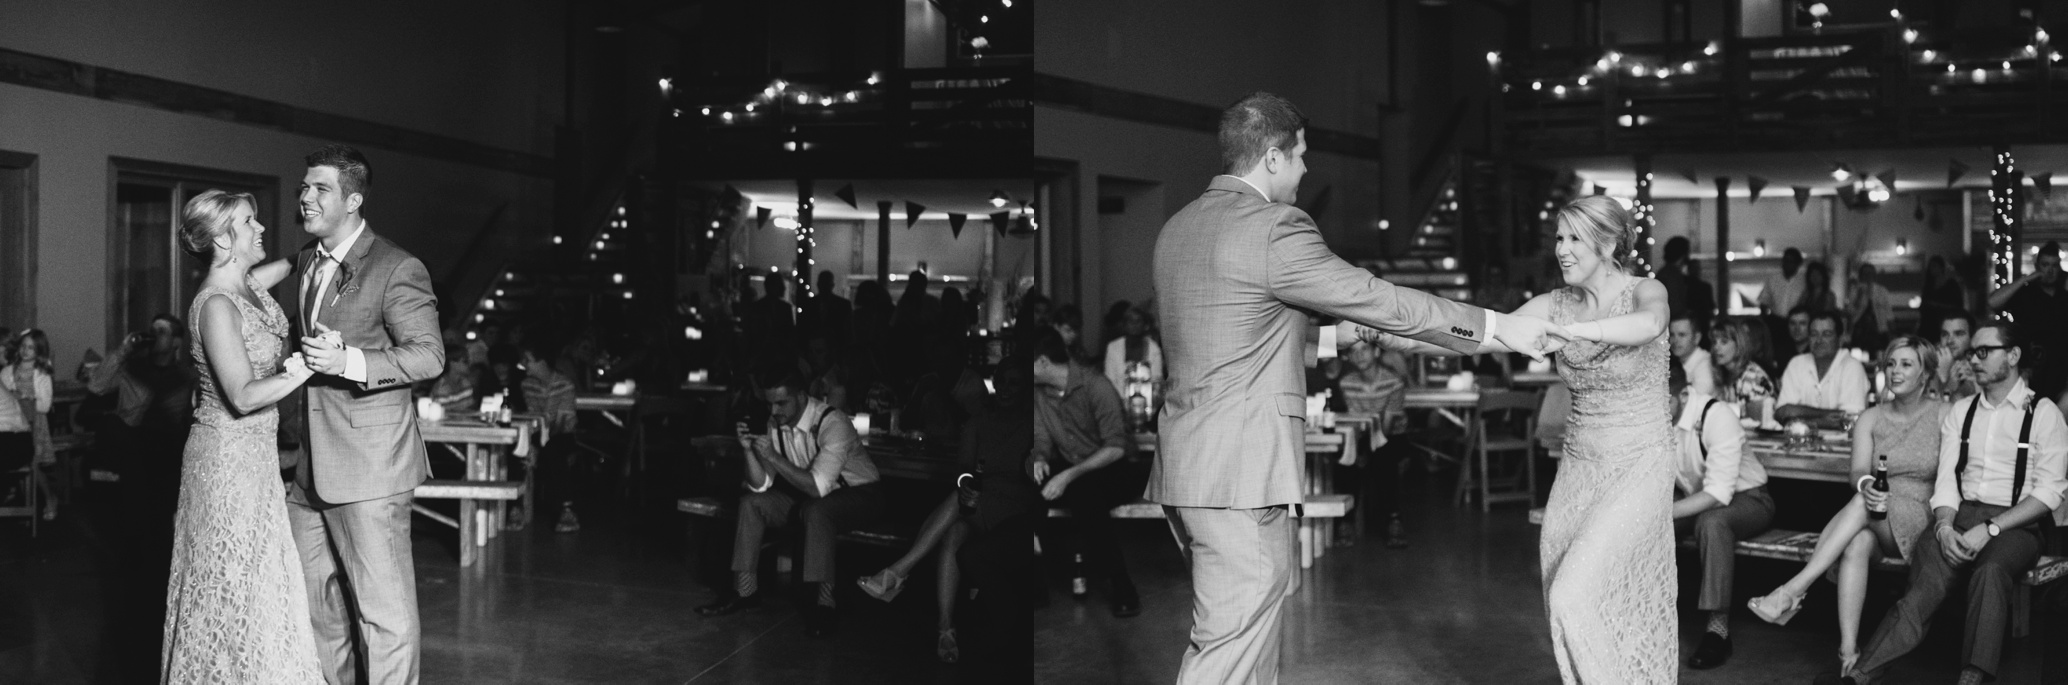 Barnes' Place Rustic Outdoor Wedding | Ali Leigh Photo Minneapolis Wedding Photographer_0176.jpg